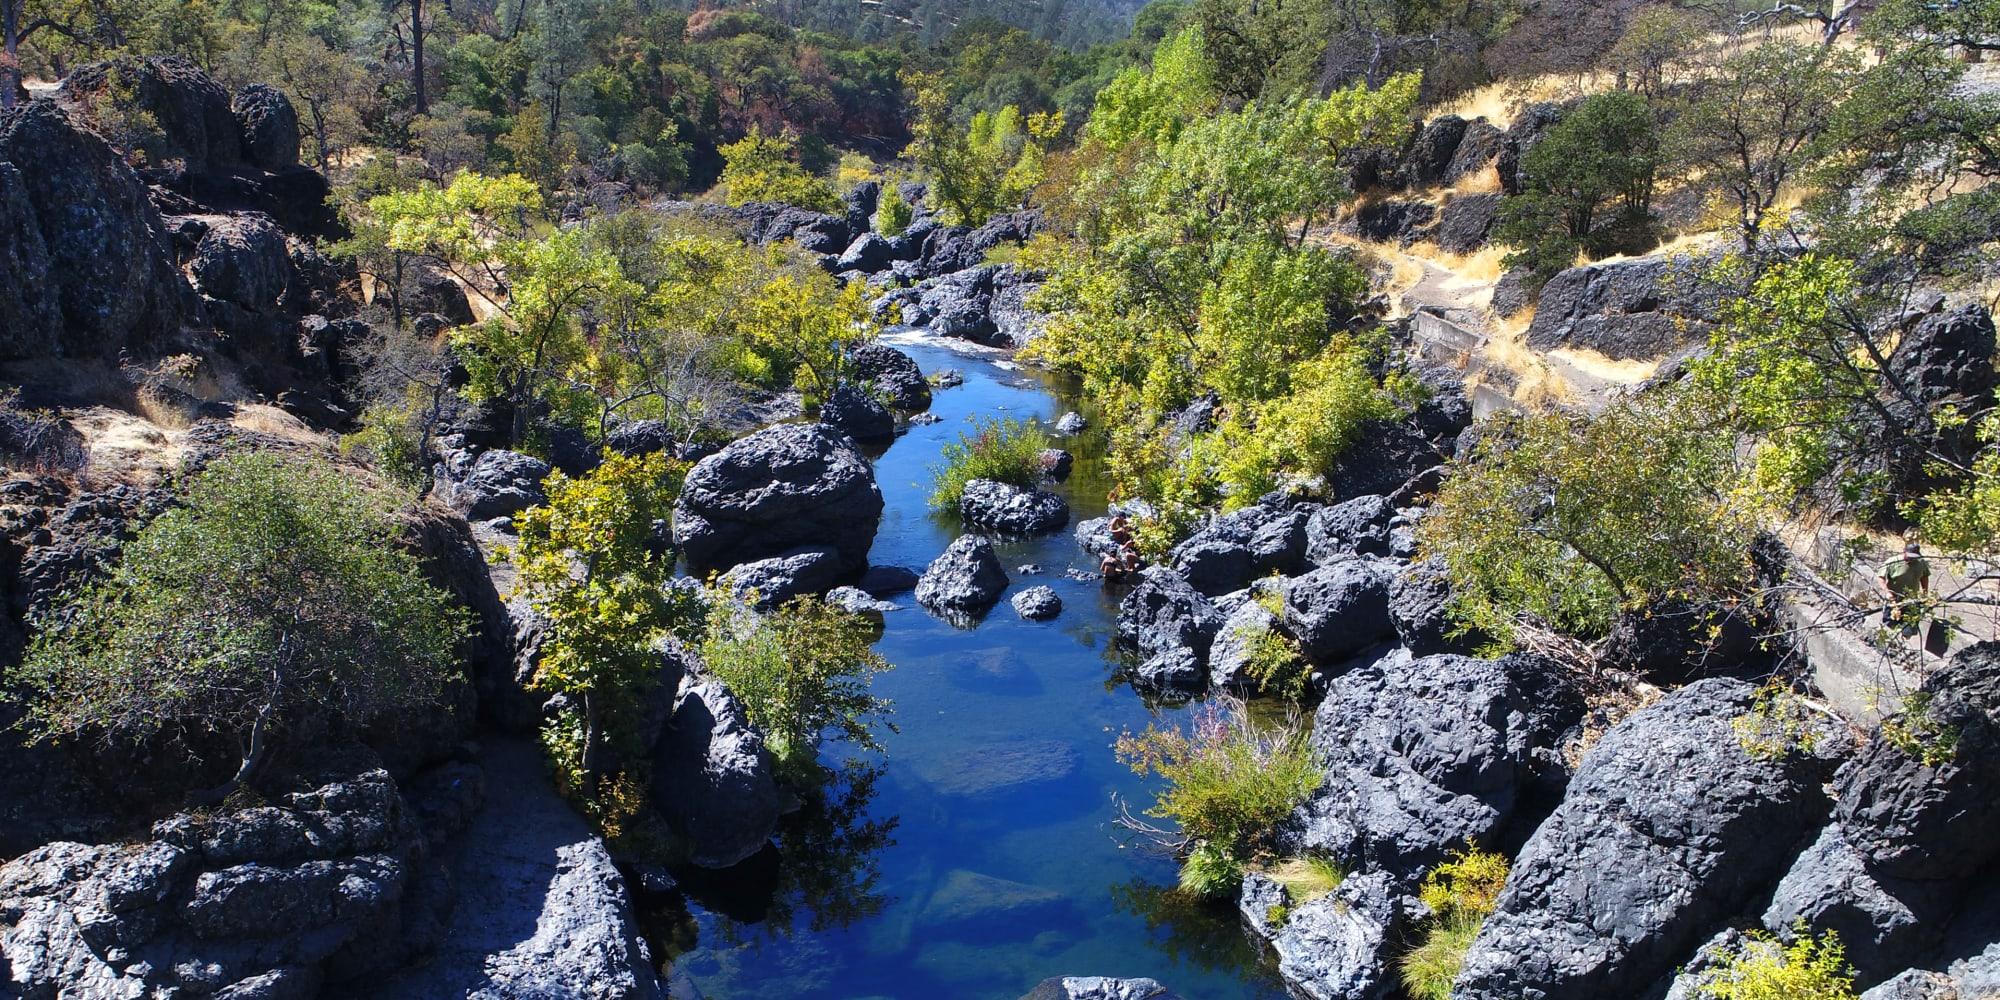 Beautiful, clear creek with riverside plants near MWS Properties in Chico, California